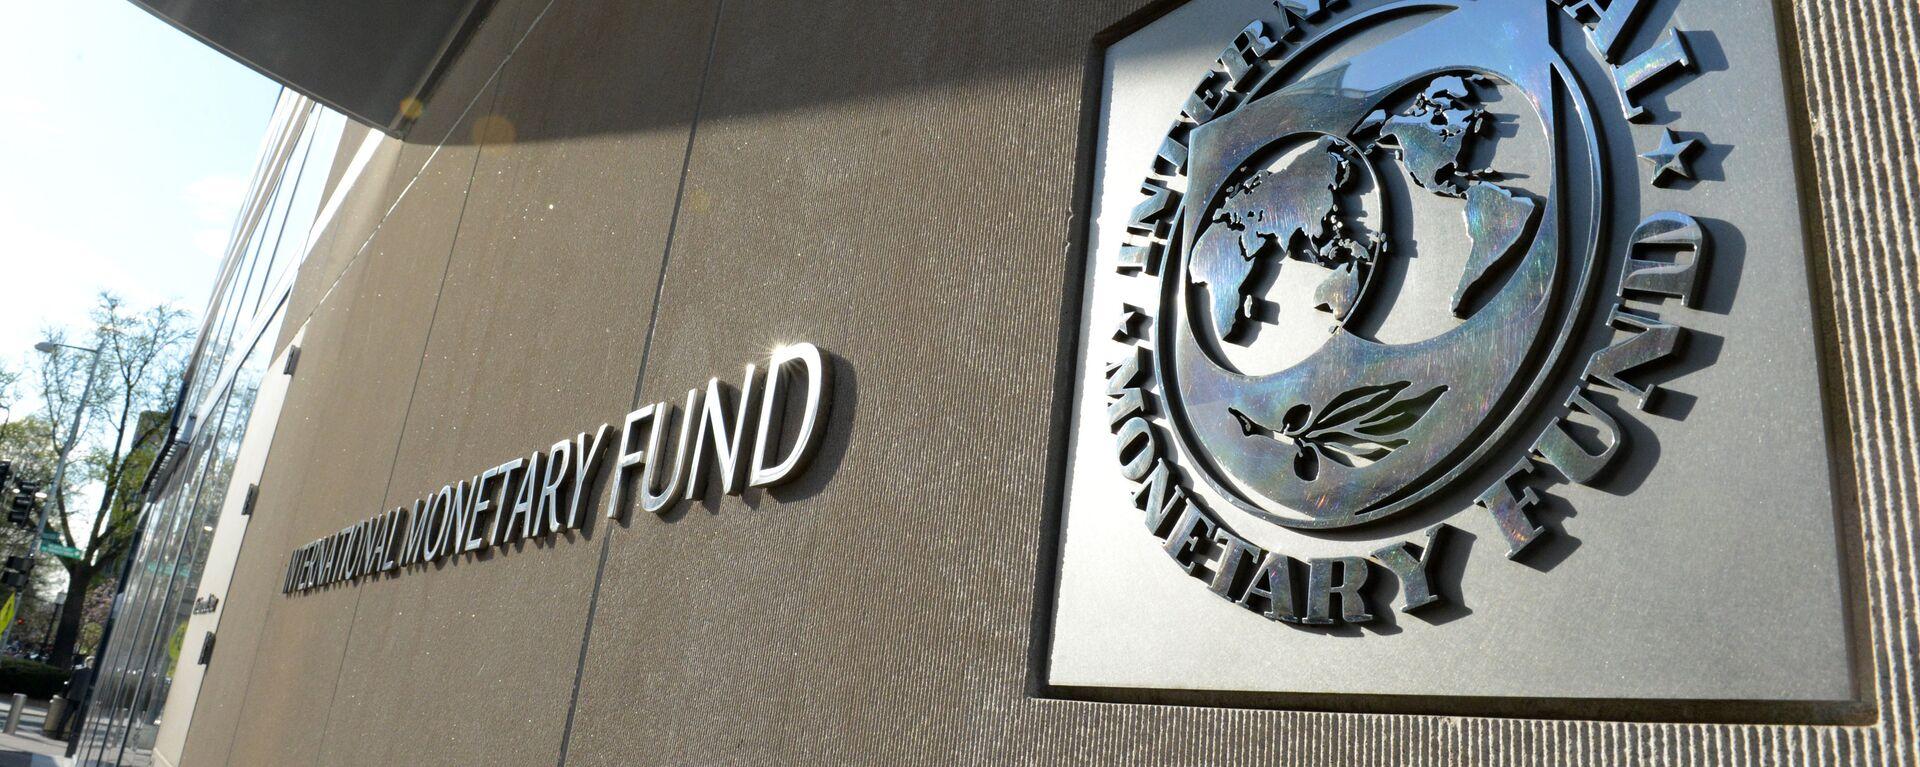 Табличка с логотипом Международного валютного фонда на стене здания МВФ - Sputnik Азербайджан, 1920, 20.10.2020